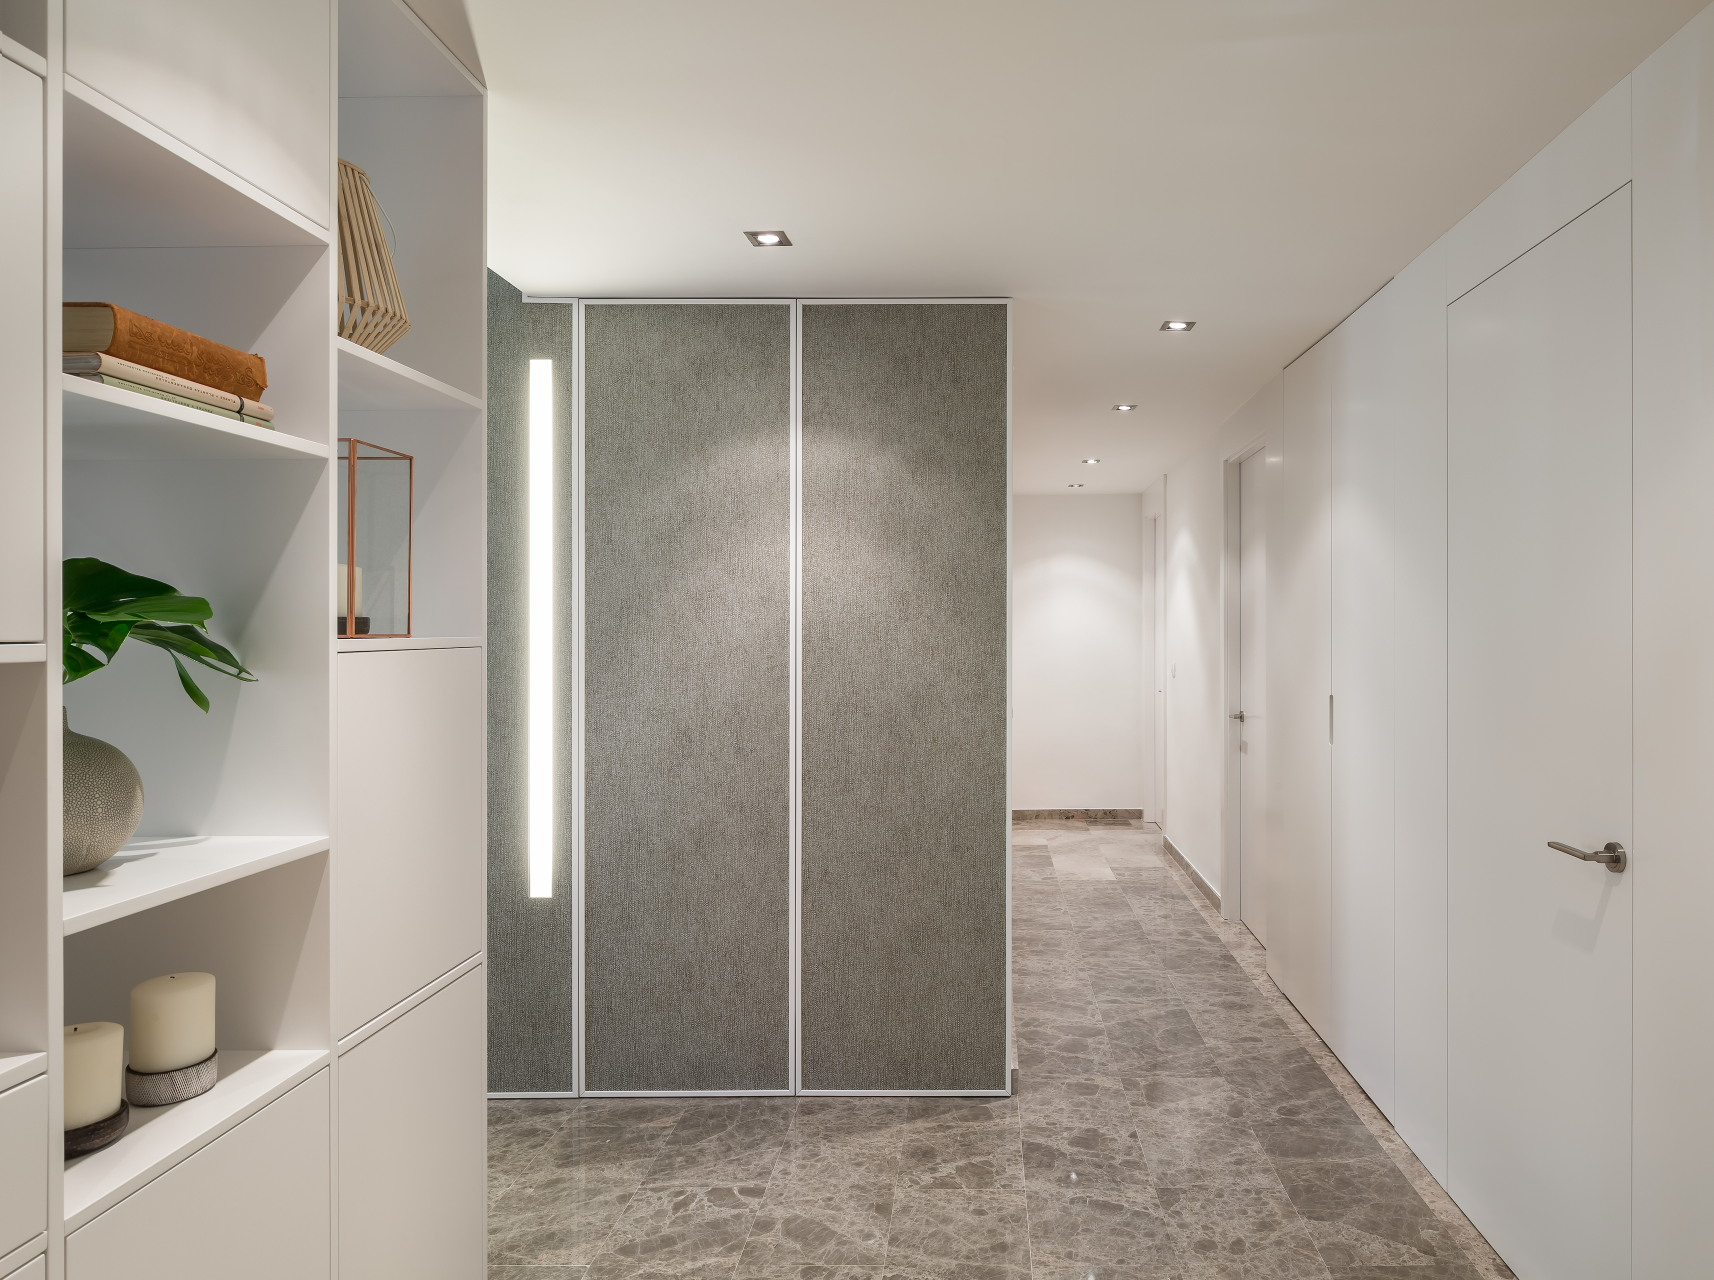 fotografia-arquitectura-interiorismo-valencia-german-cabo-laura-yerpes-mandas (1)